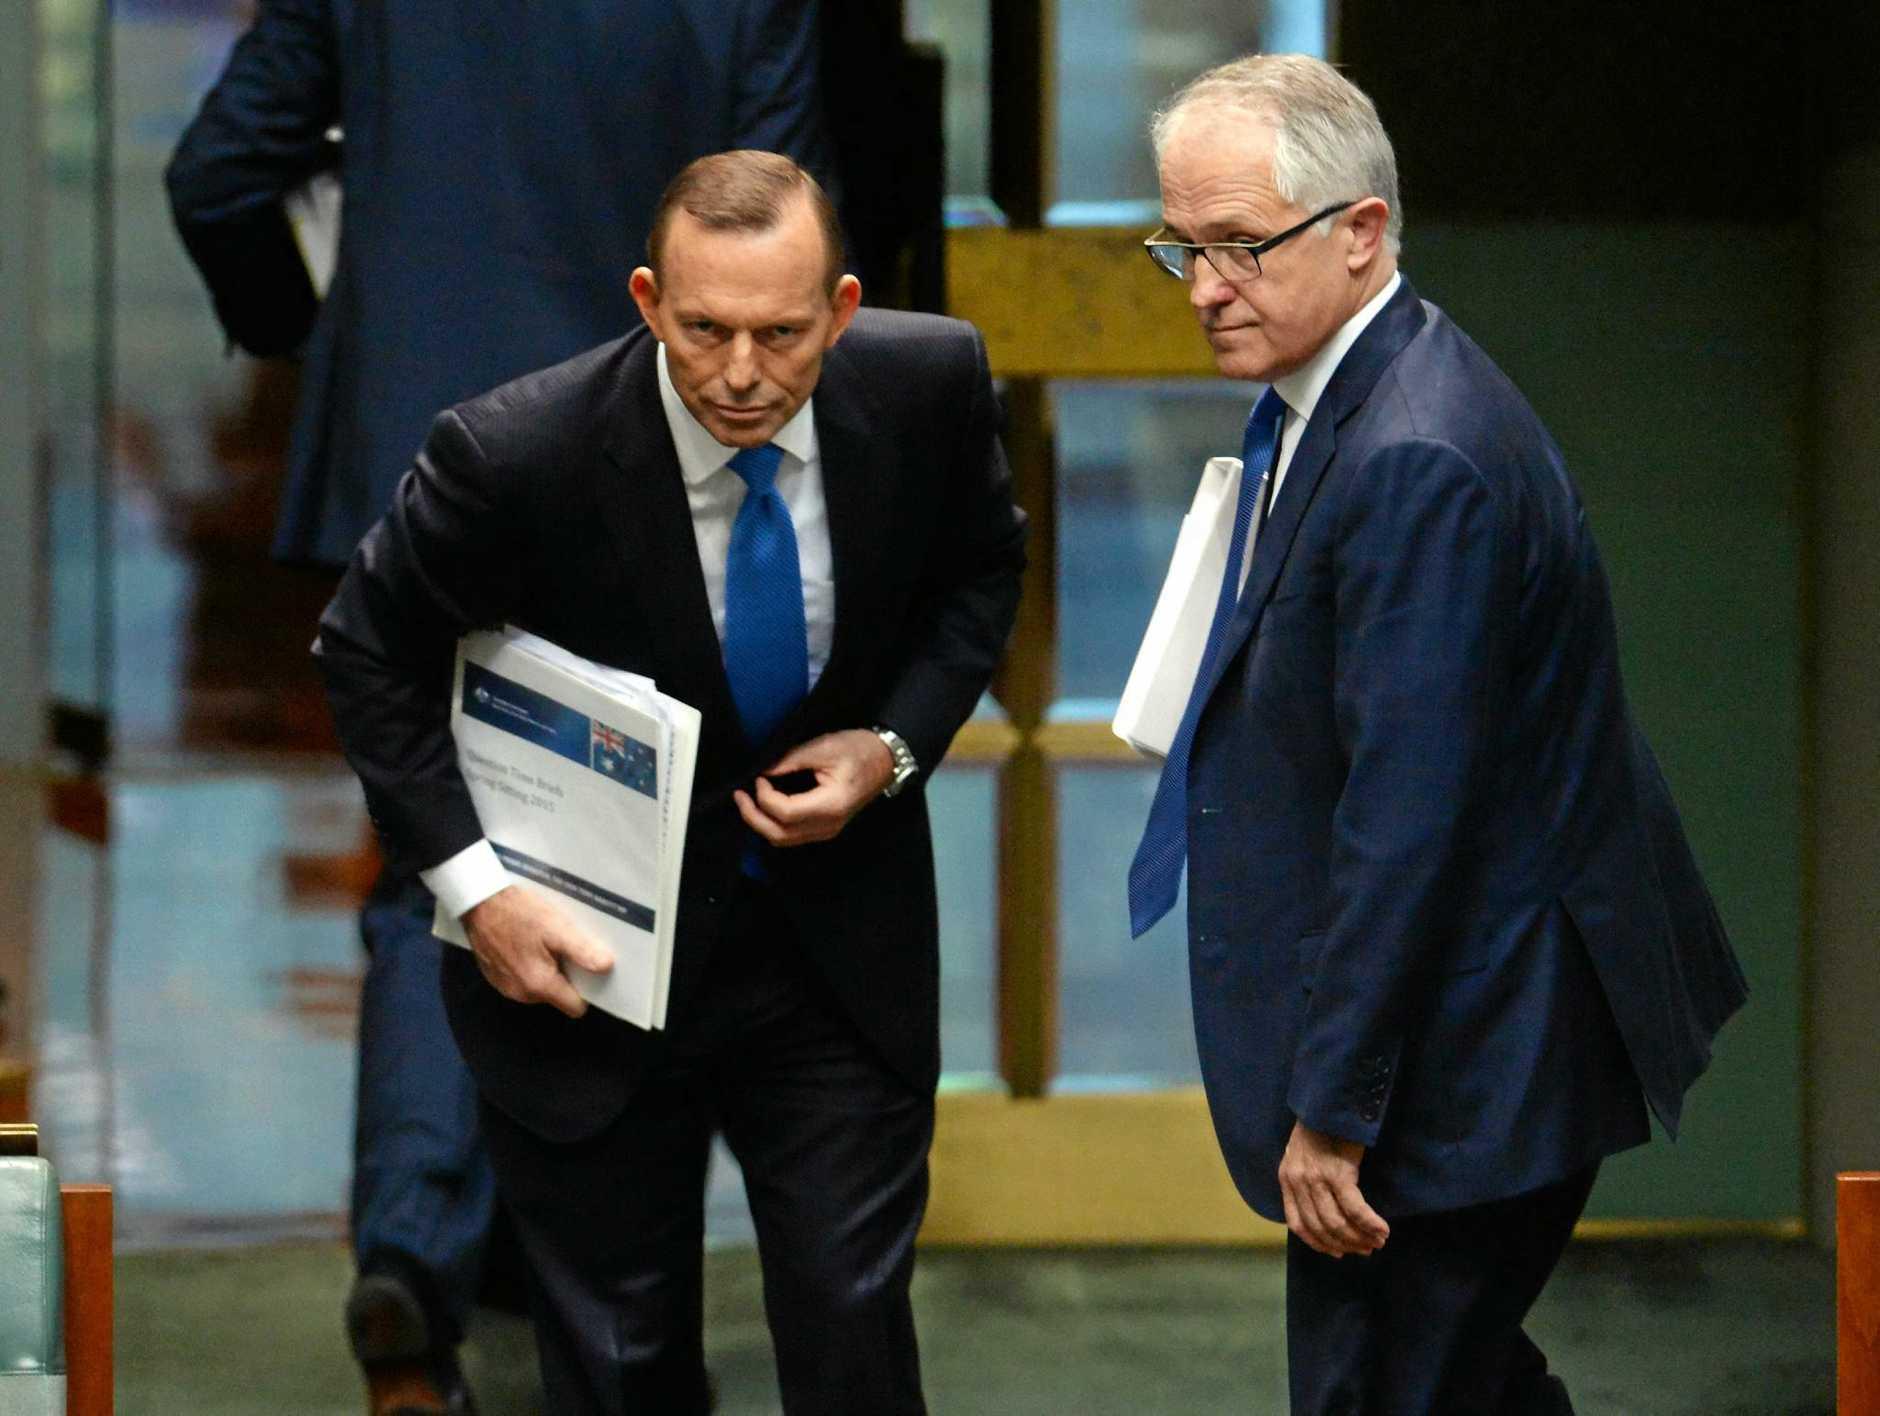 Tony Abbott and Malcolm Turnbull FILE